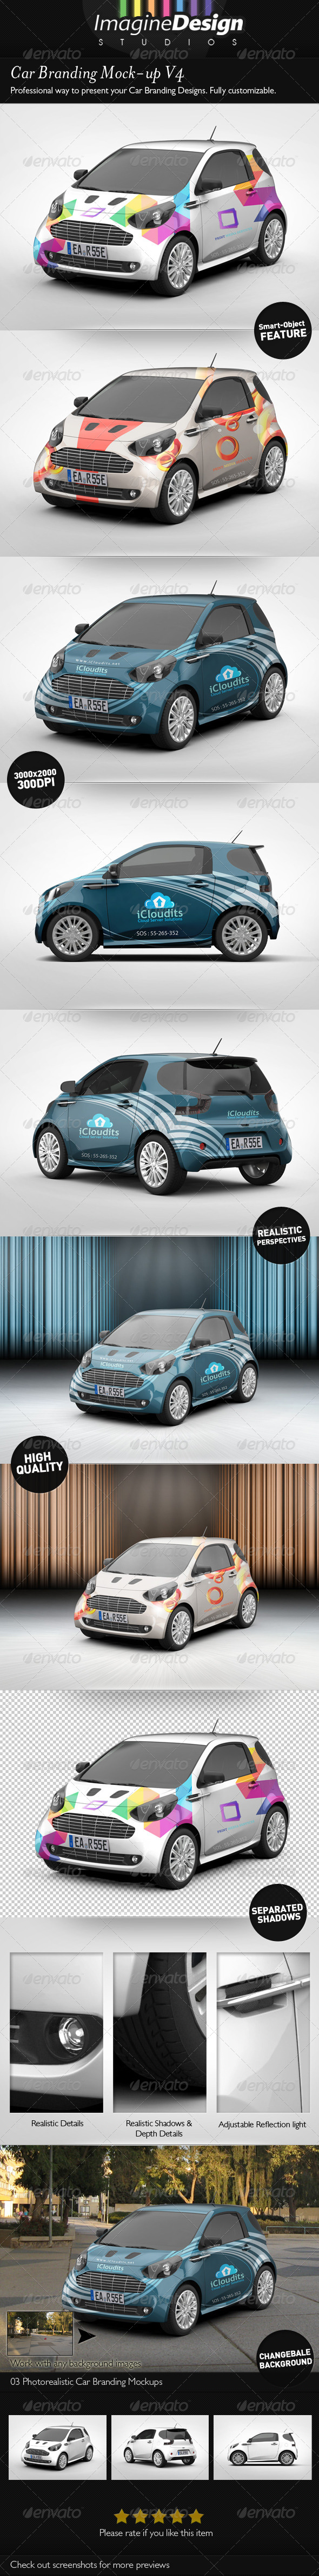 GraphicRiver Car Branding Mock-Up V4 5988287